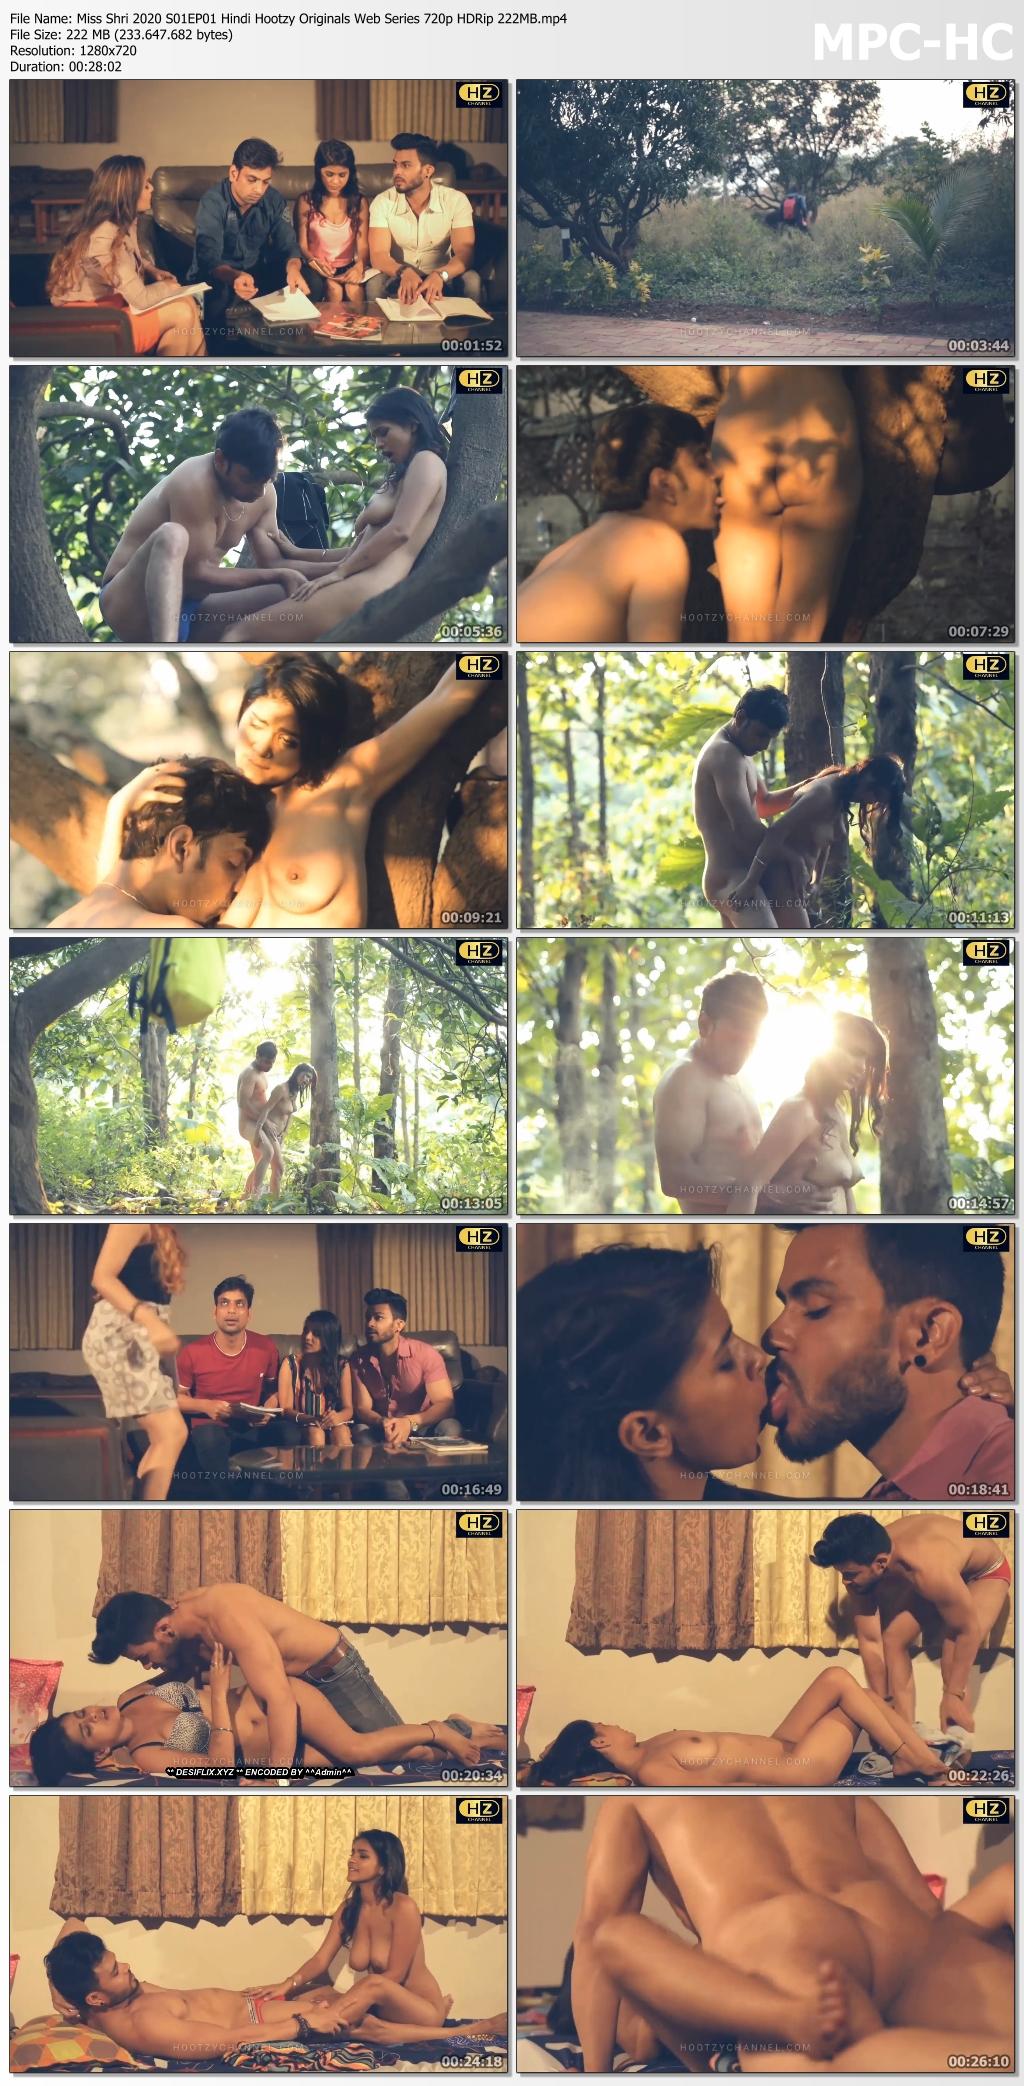 Miss-Shri-2020-S01-EP01-Hindi-Hootzy-Originals-Web-Series-720p-HDRip-222-MB-mp4-thumbs